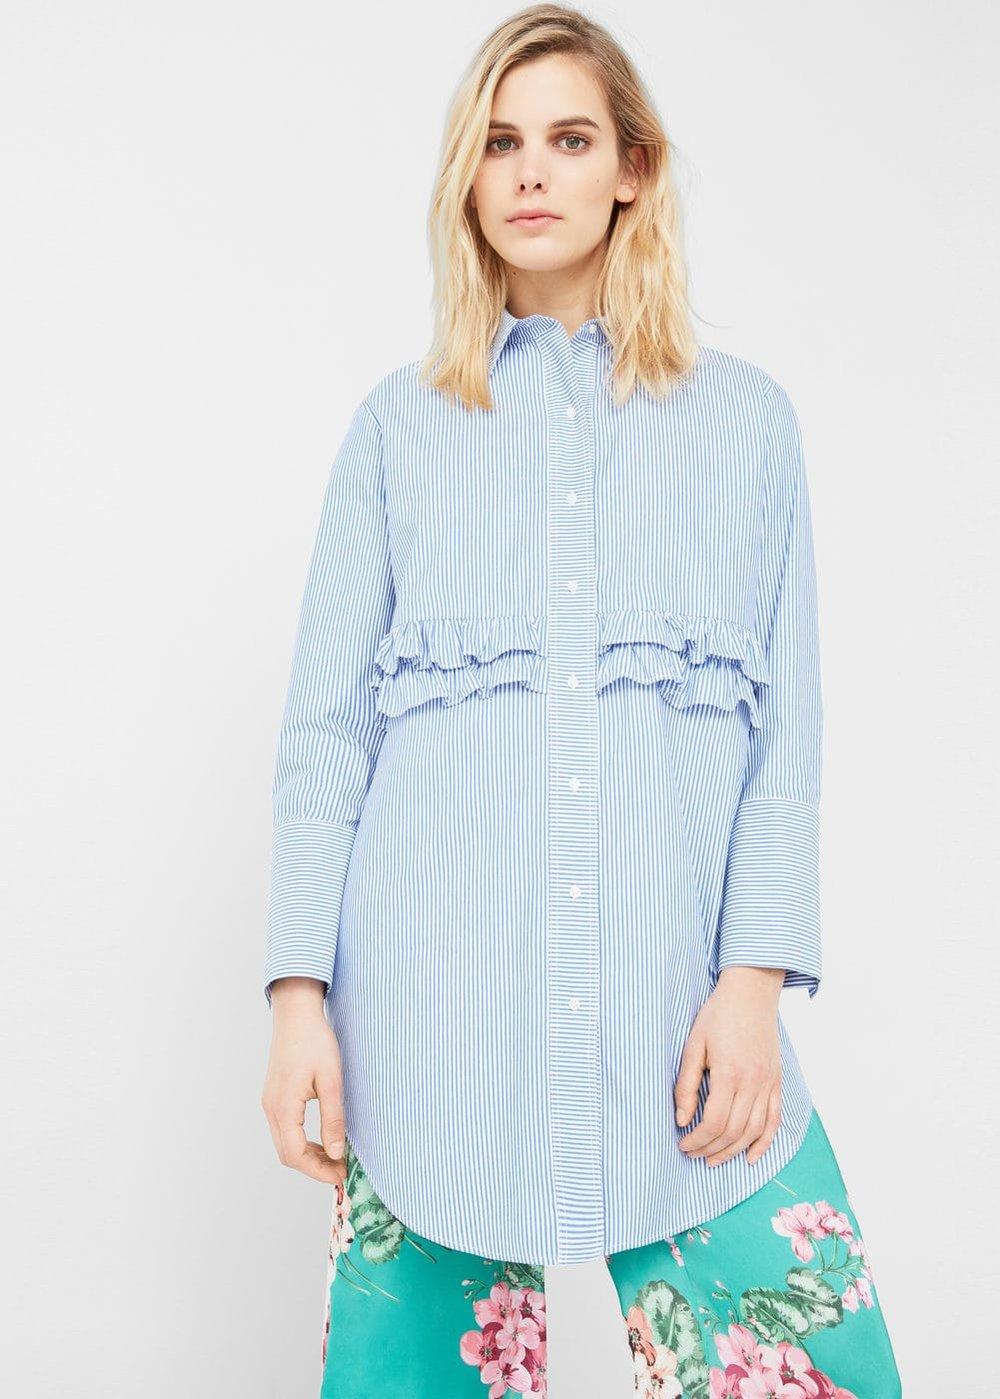 Mango: ruffled poplin shirt, £35.99